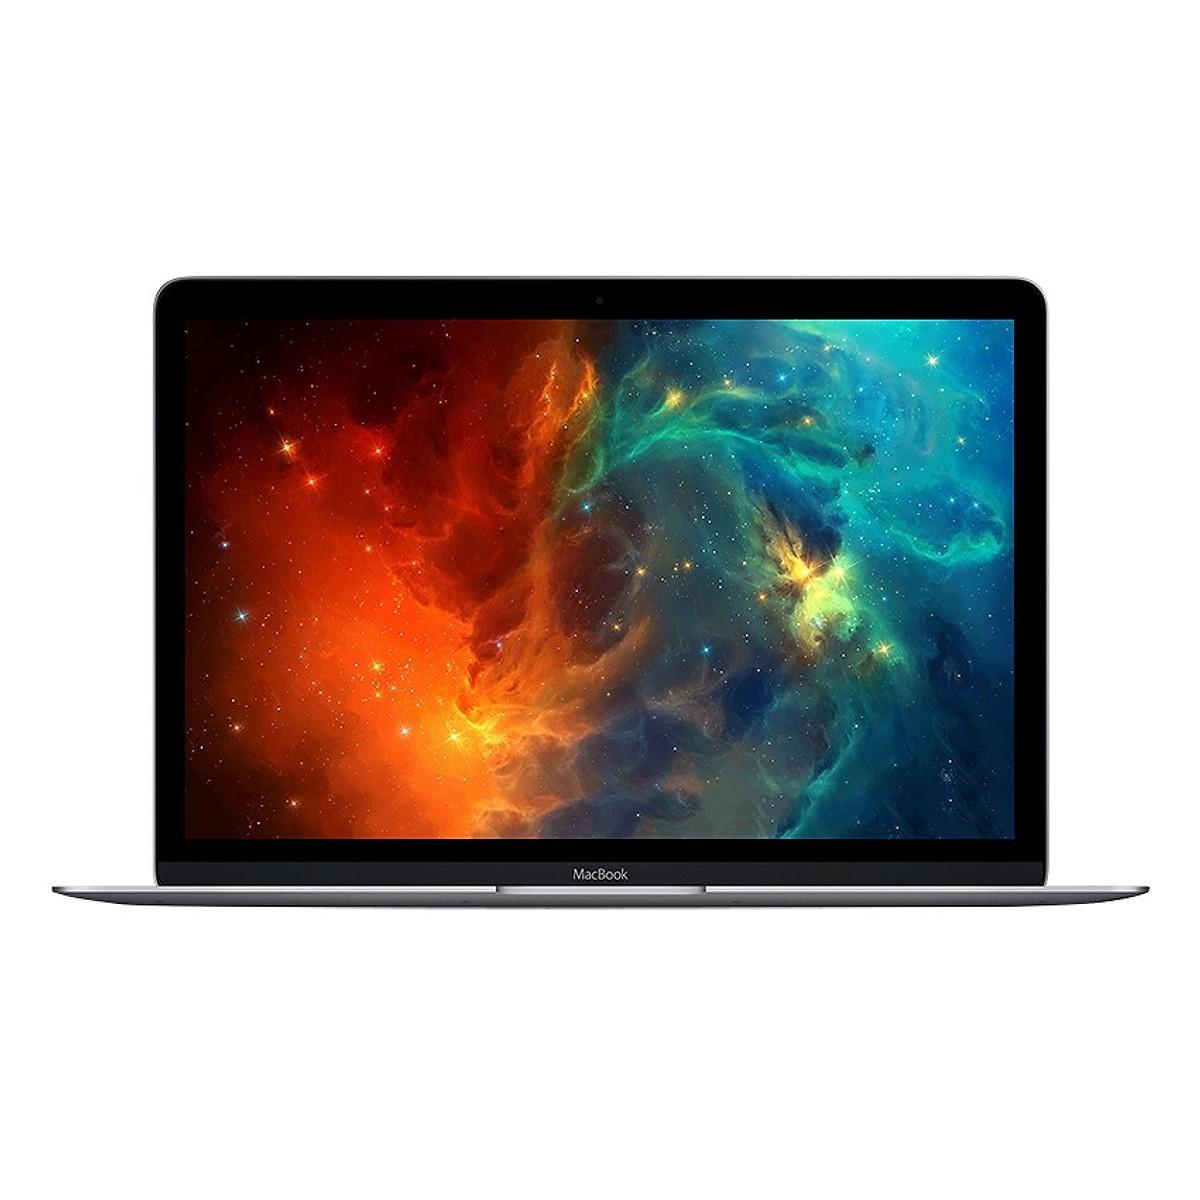 The New Macbook 12 Inch 2017-2018 Core M3 8GB 256GB ( Gold , Gray )